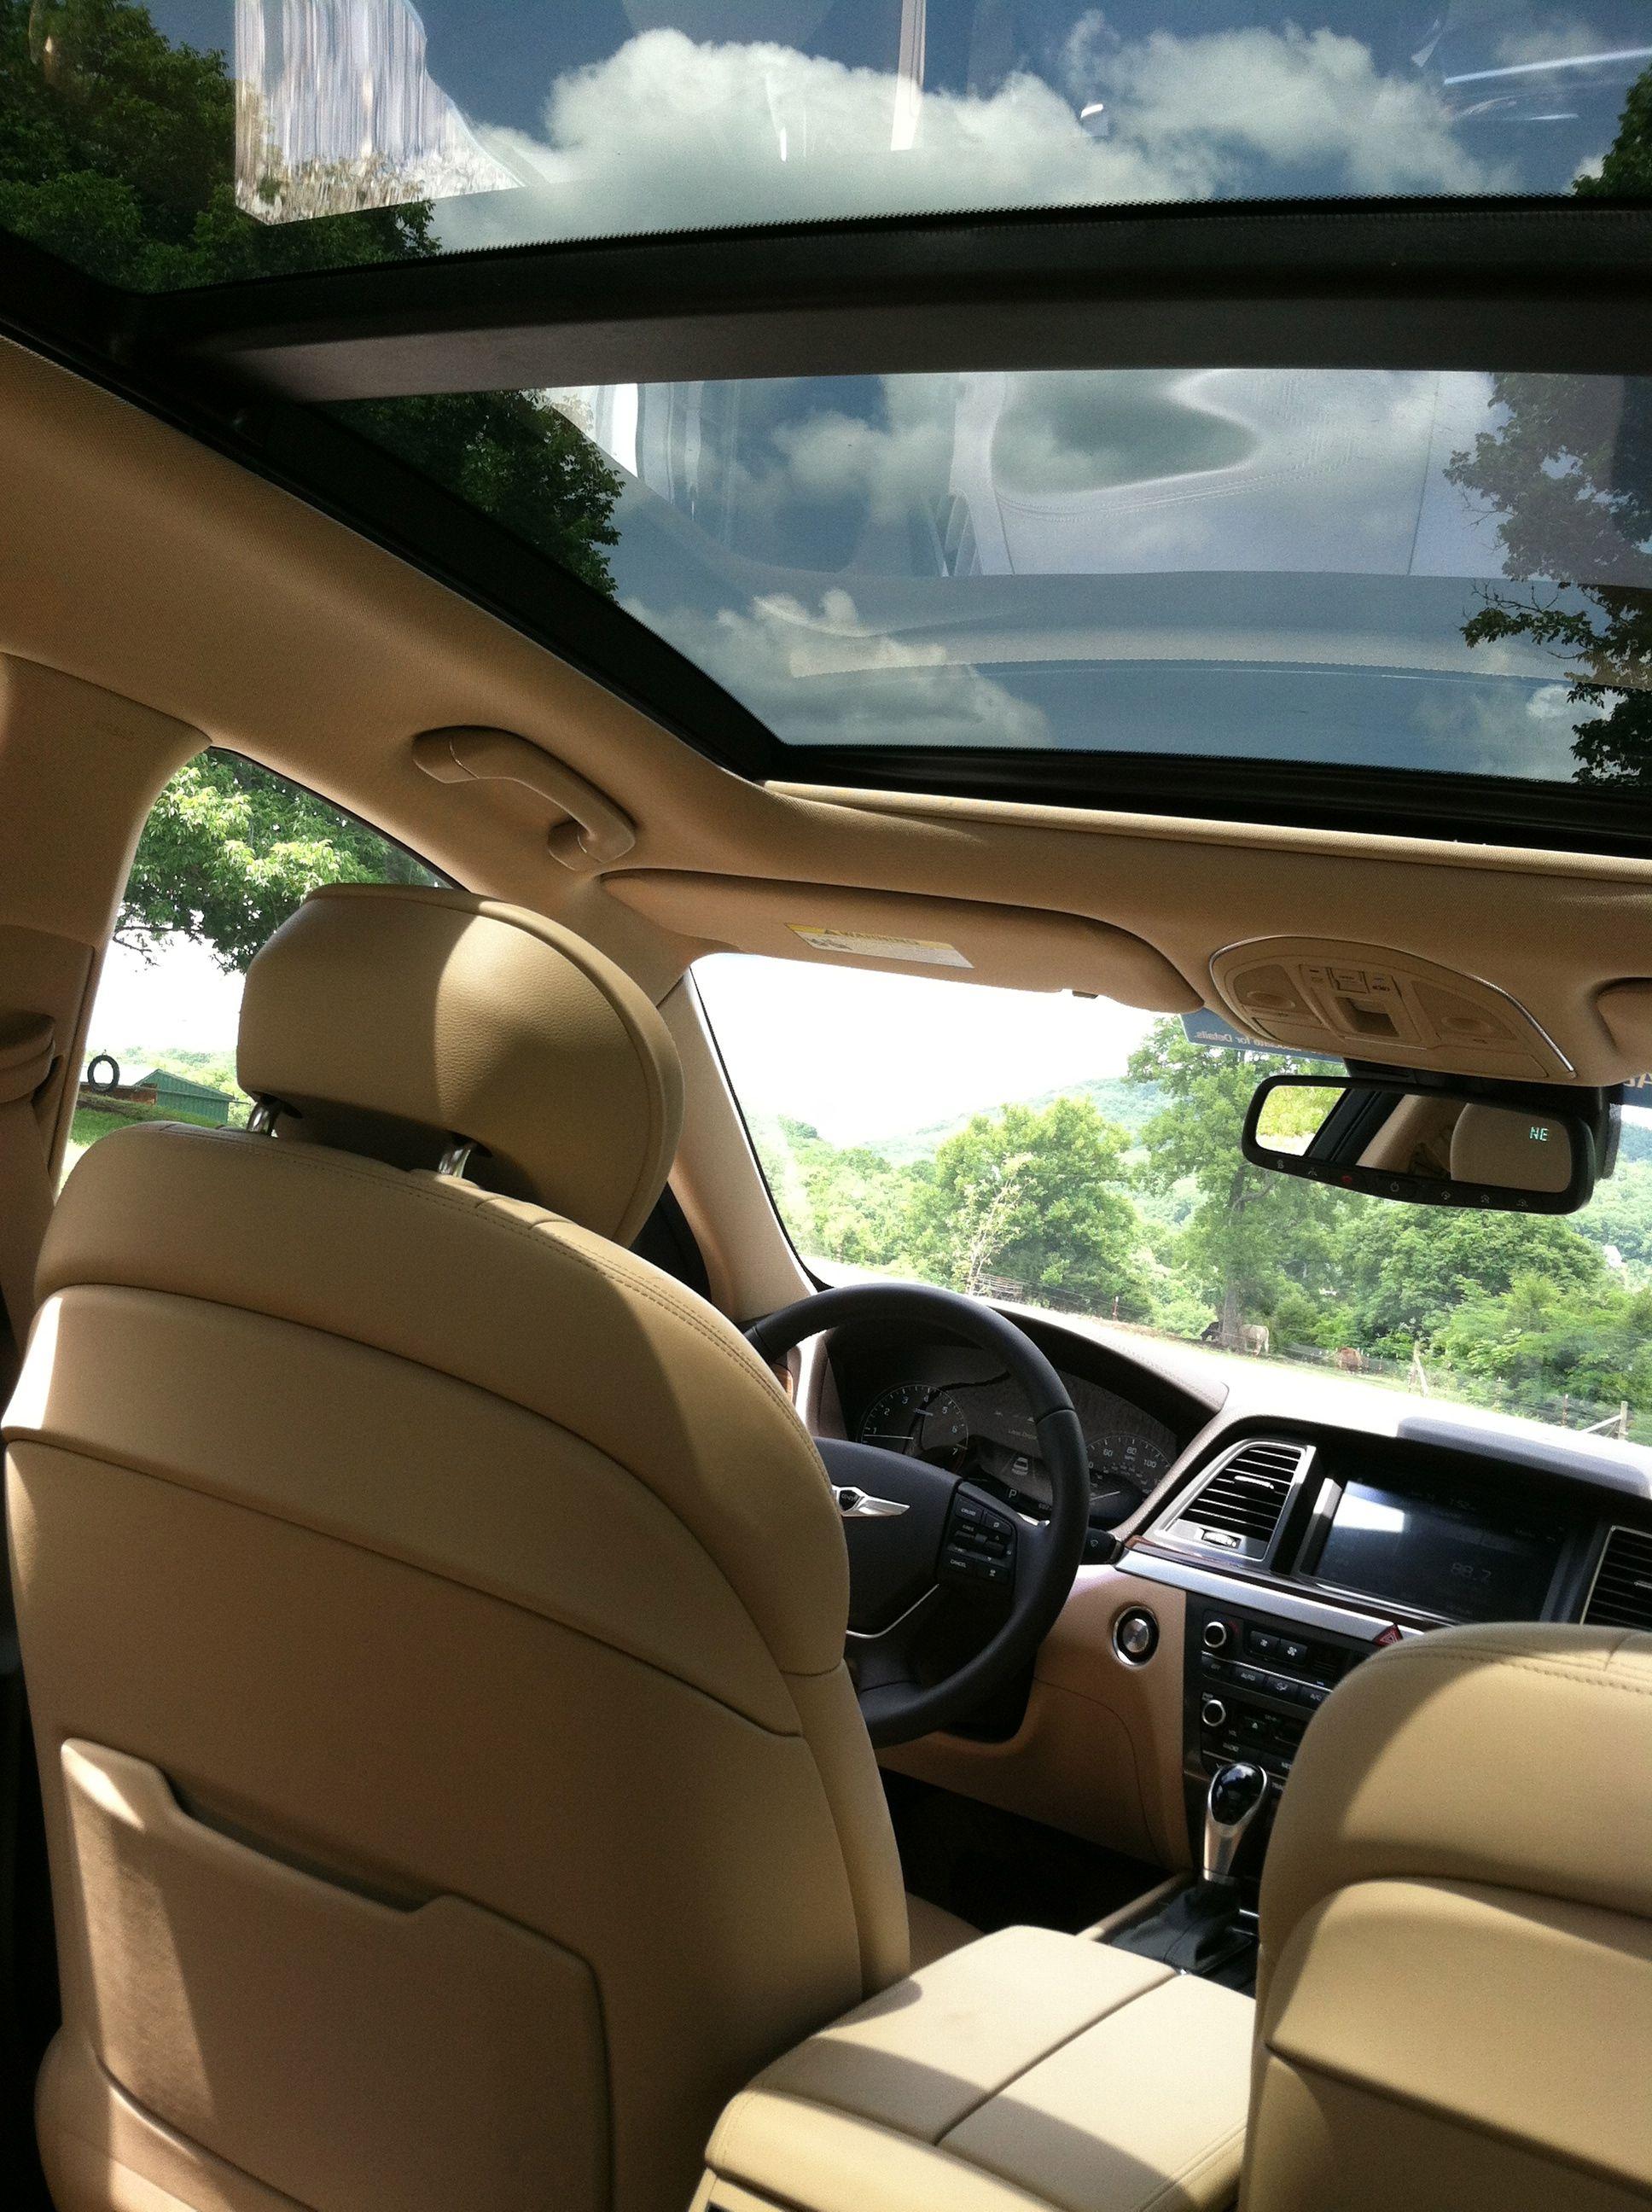 Panoramic Sunroof - 2015 Hyundai Genesis | 2015 Hyundai